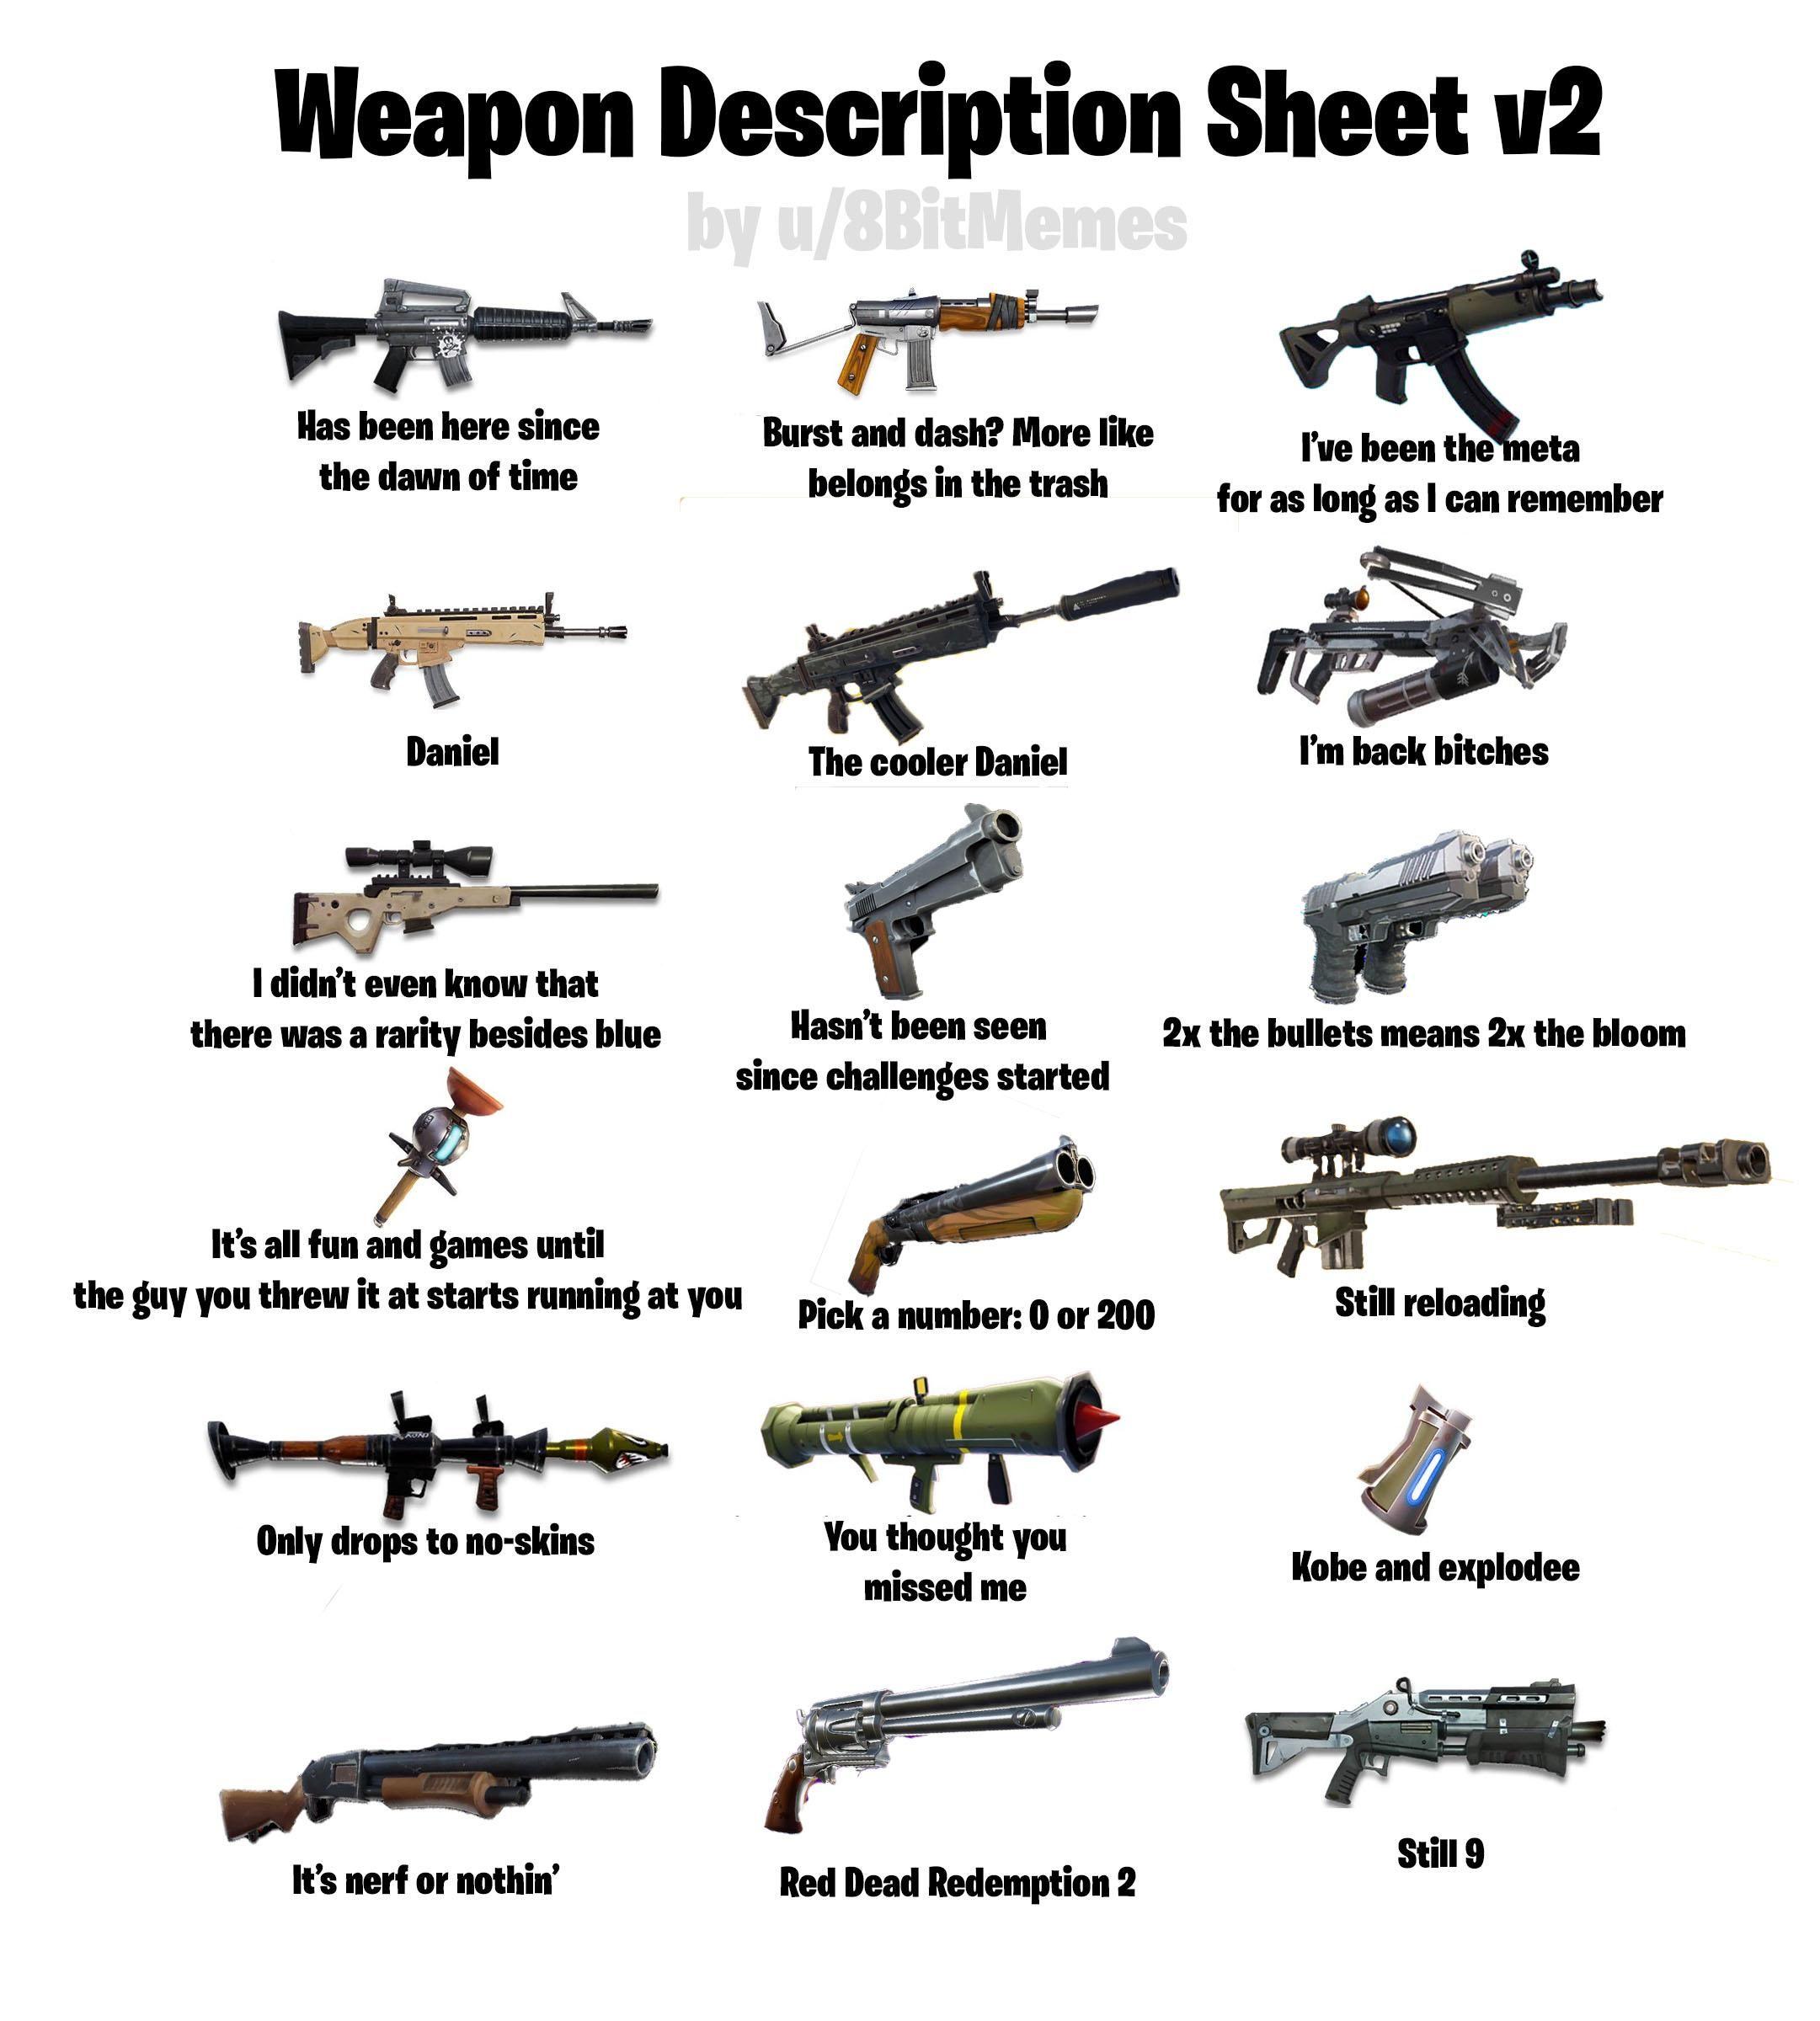 Weapon Description Sheet V2 Via 8bitmemes Funny Gaming Memes Funny Memes Gaming Memes